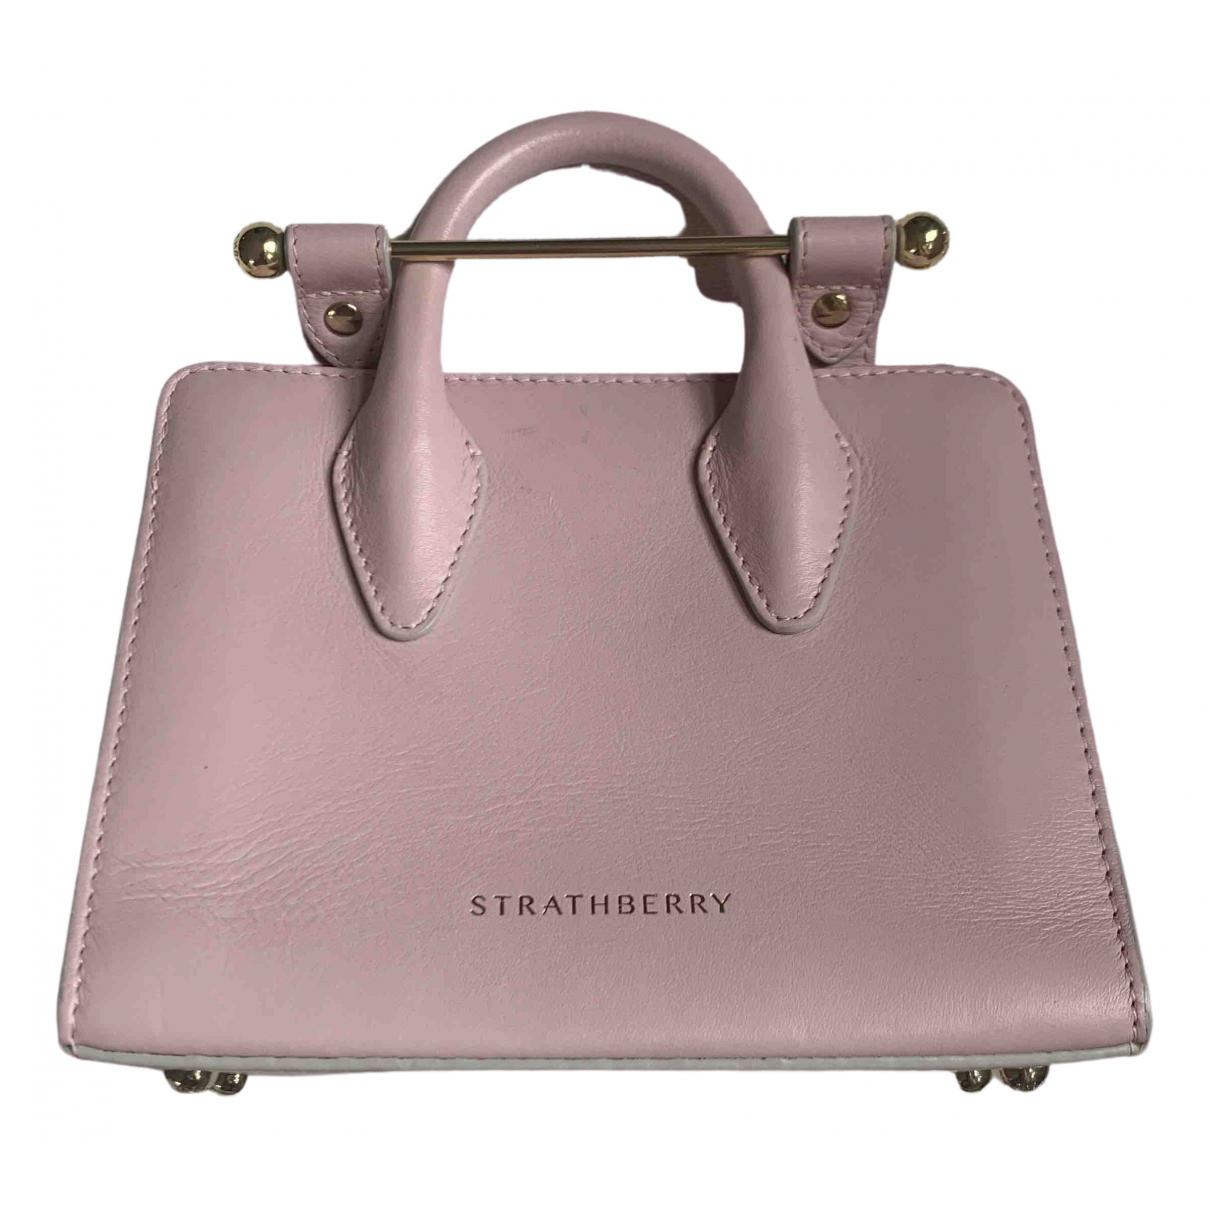 Strathberry - Sac a main   pour femme en cuir - rose